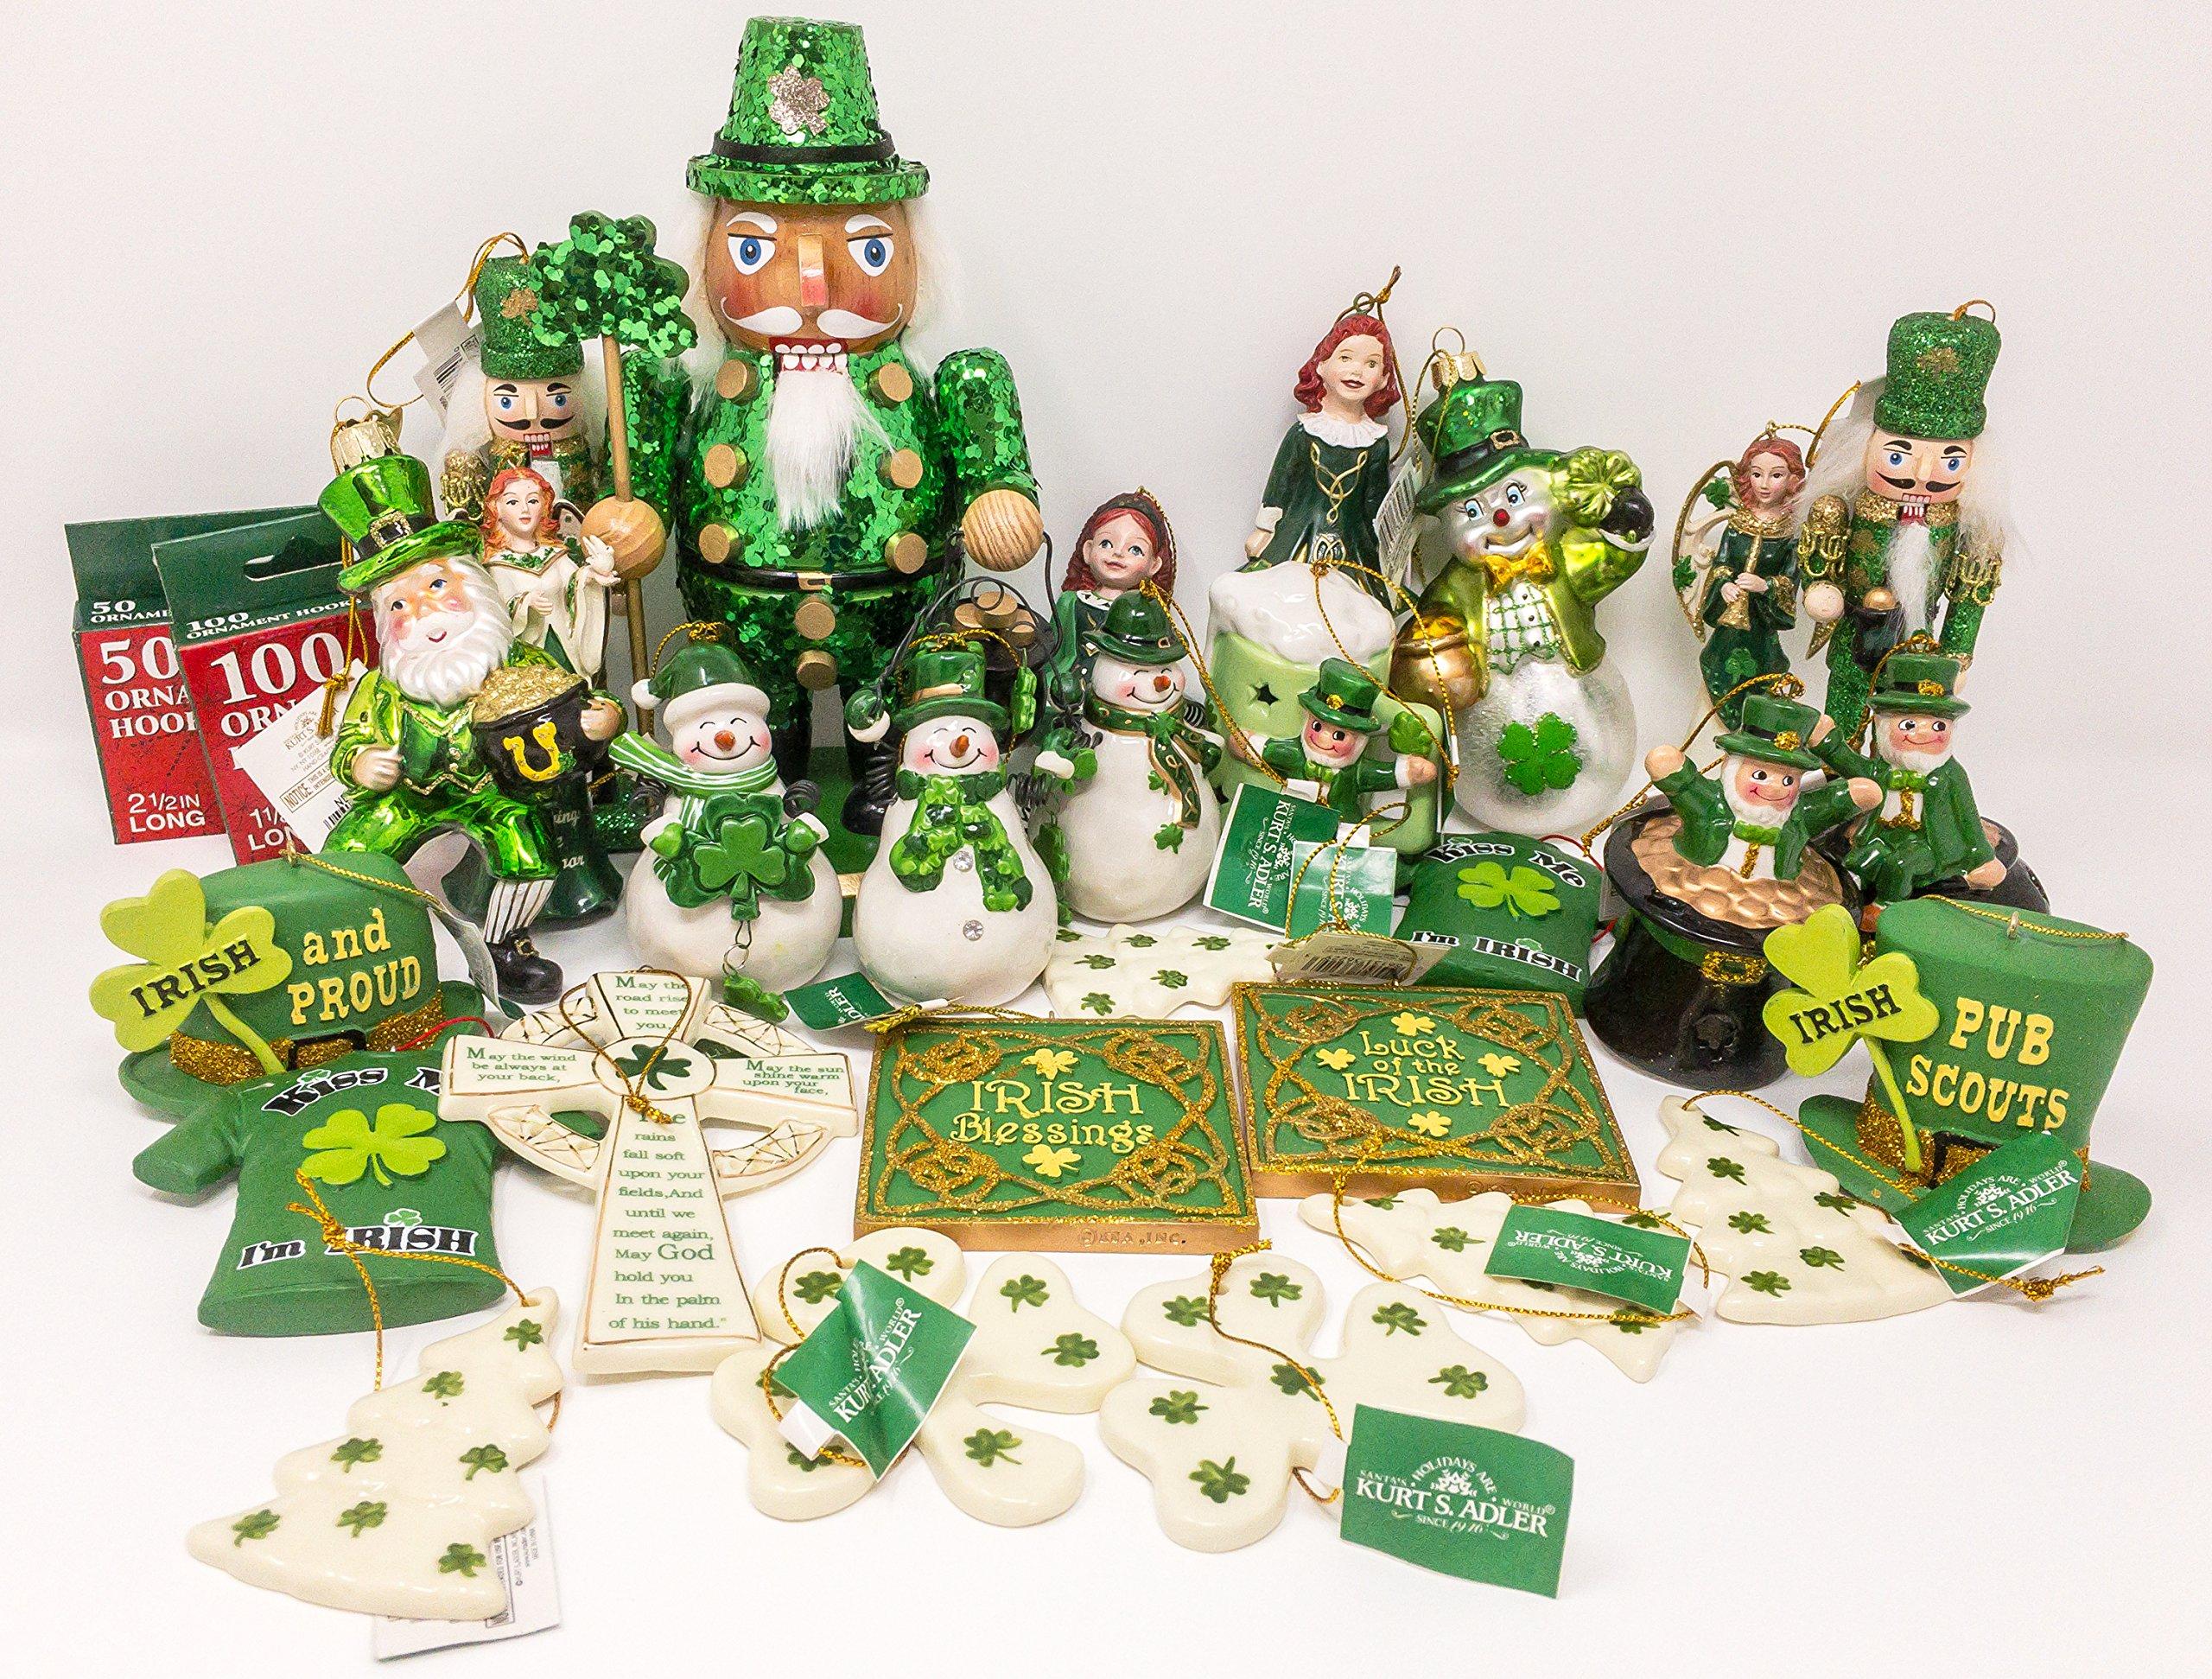 JZ Bundles Large Set - Irish - Kurt Adler - 30-Piece Bundle - A Bundle of Christmas Ornaments Great Gift